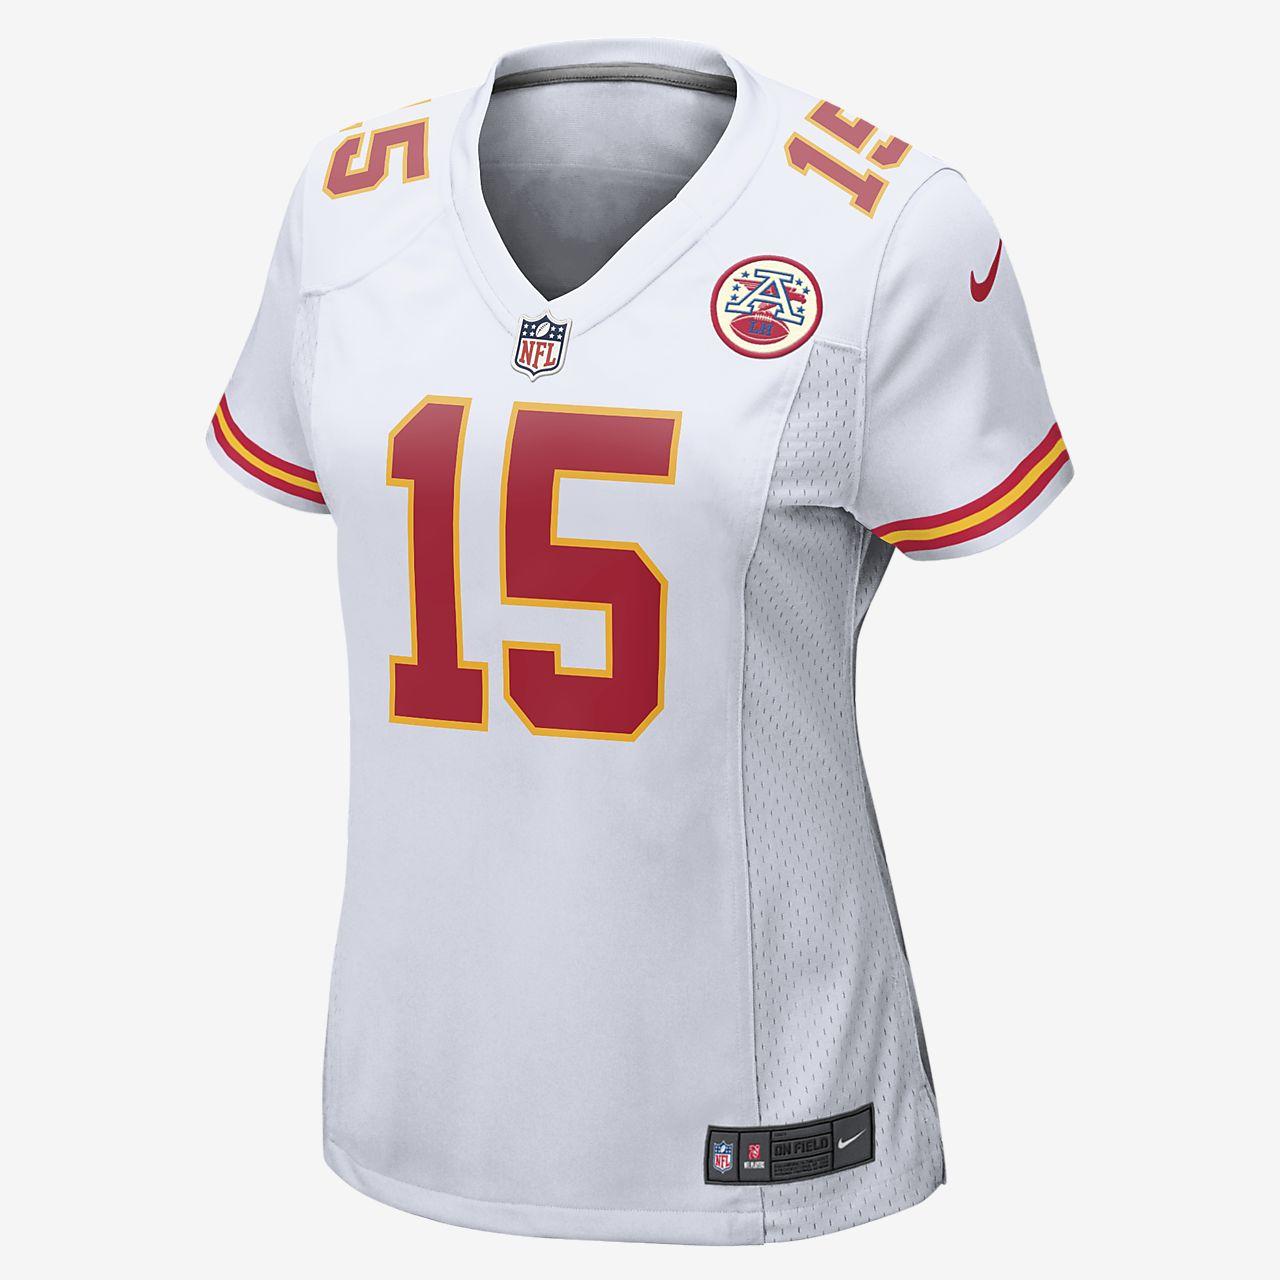 NFL Kansas City Chiefs (Patrick Mahomes) Women's Game Football Jersey